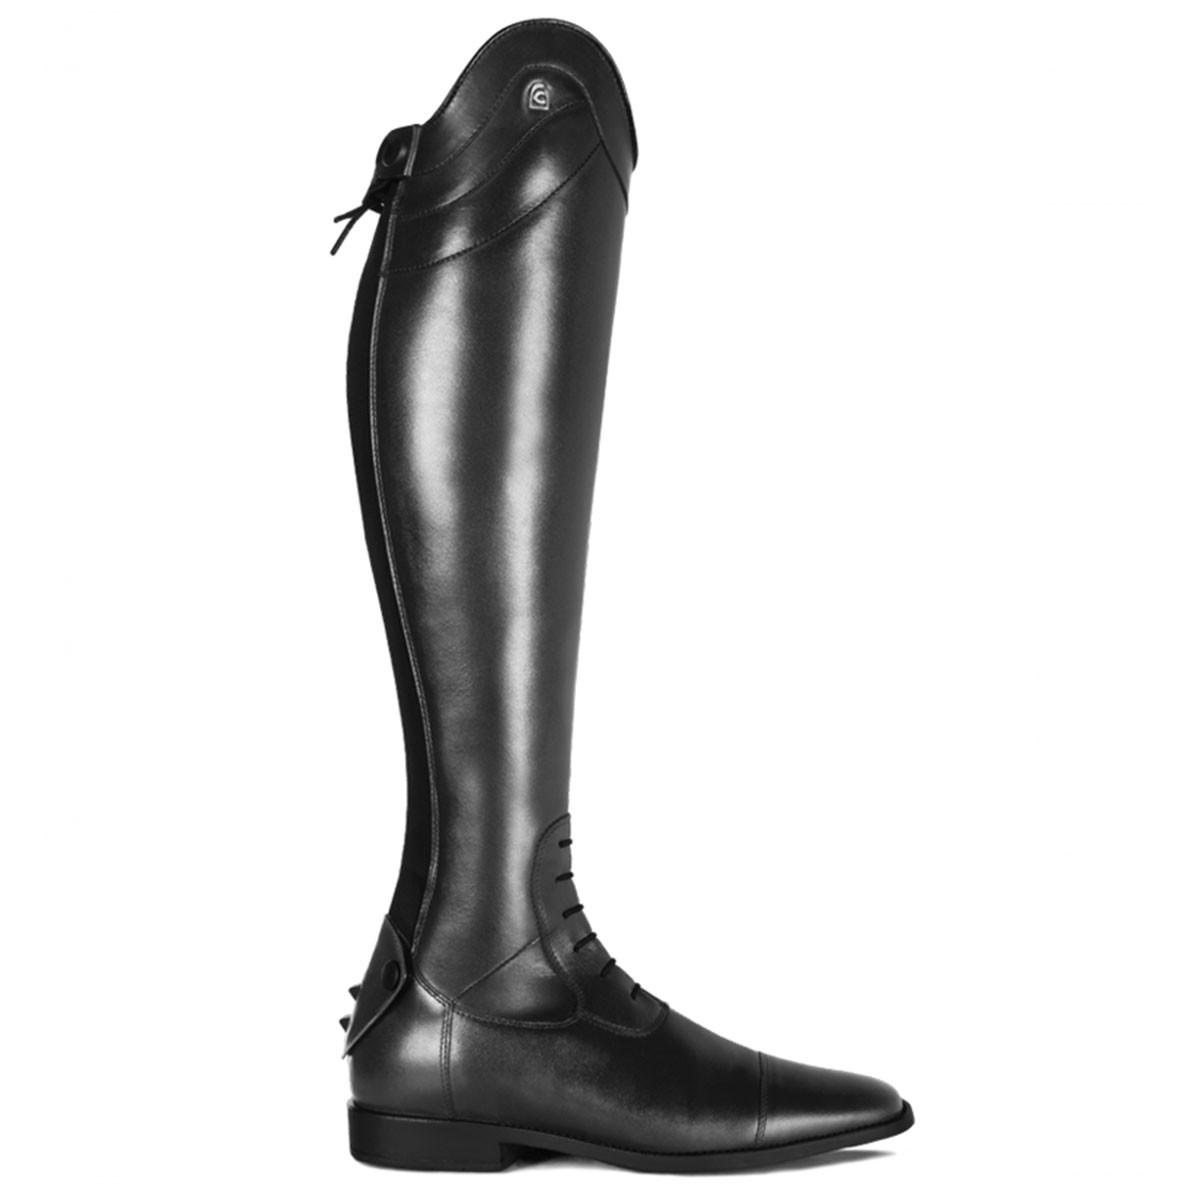 Cavallo Linus Slim rijlaars zwart maat:7-7.5 / h50-w37